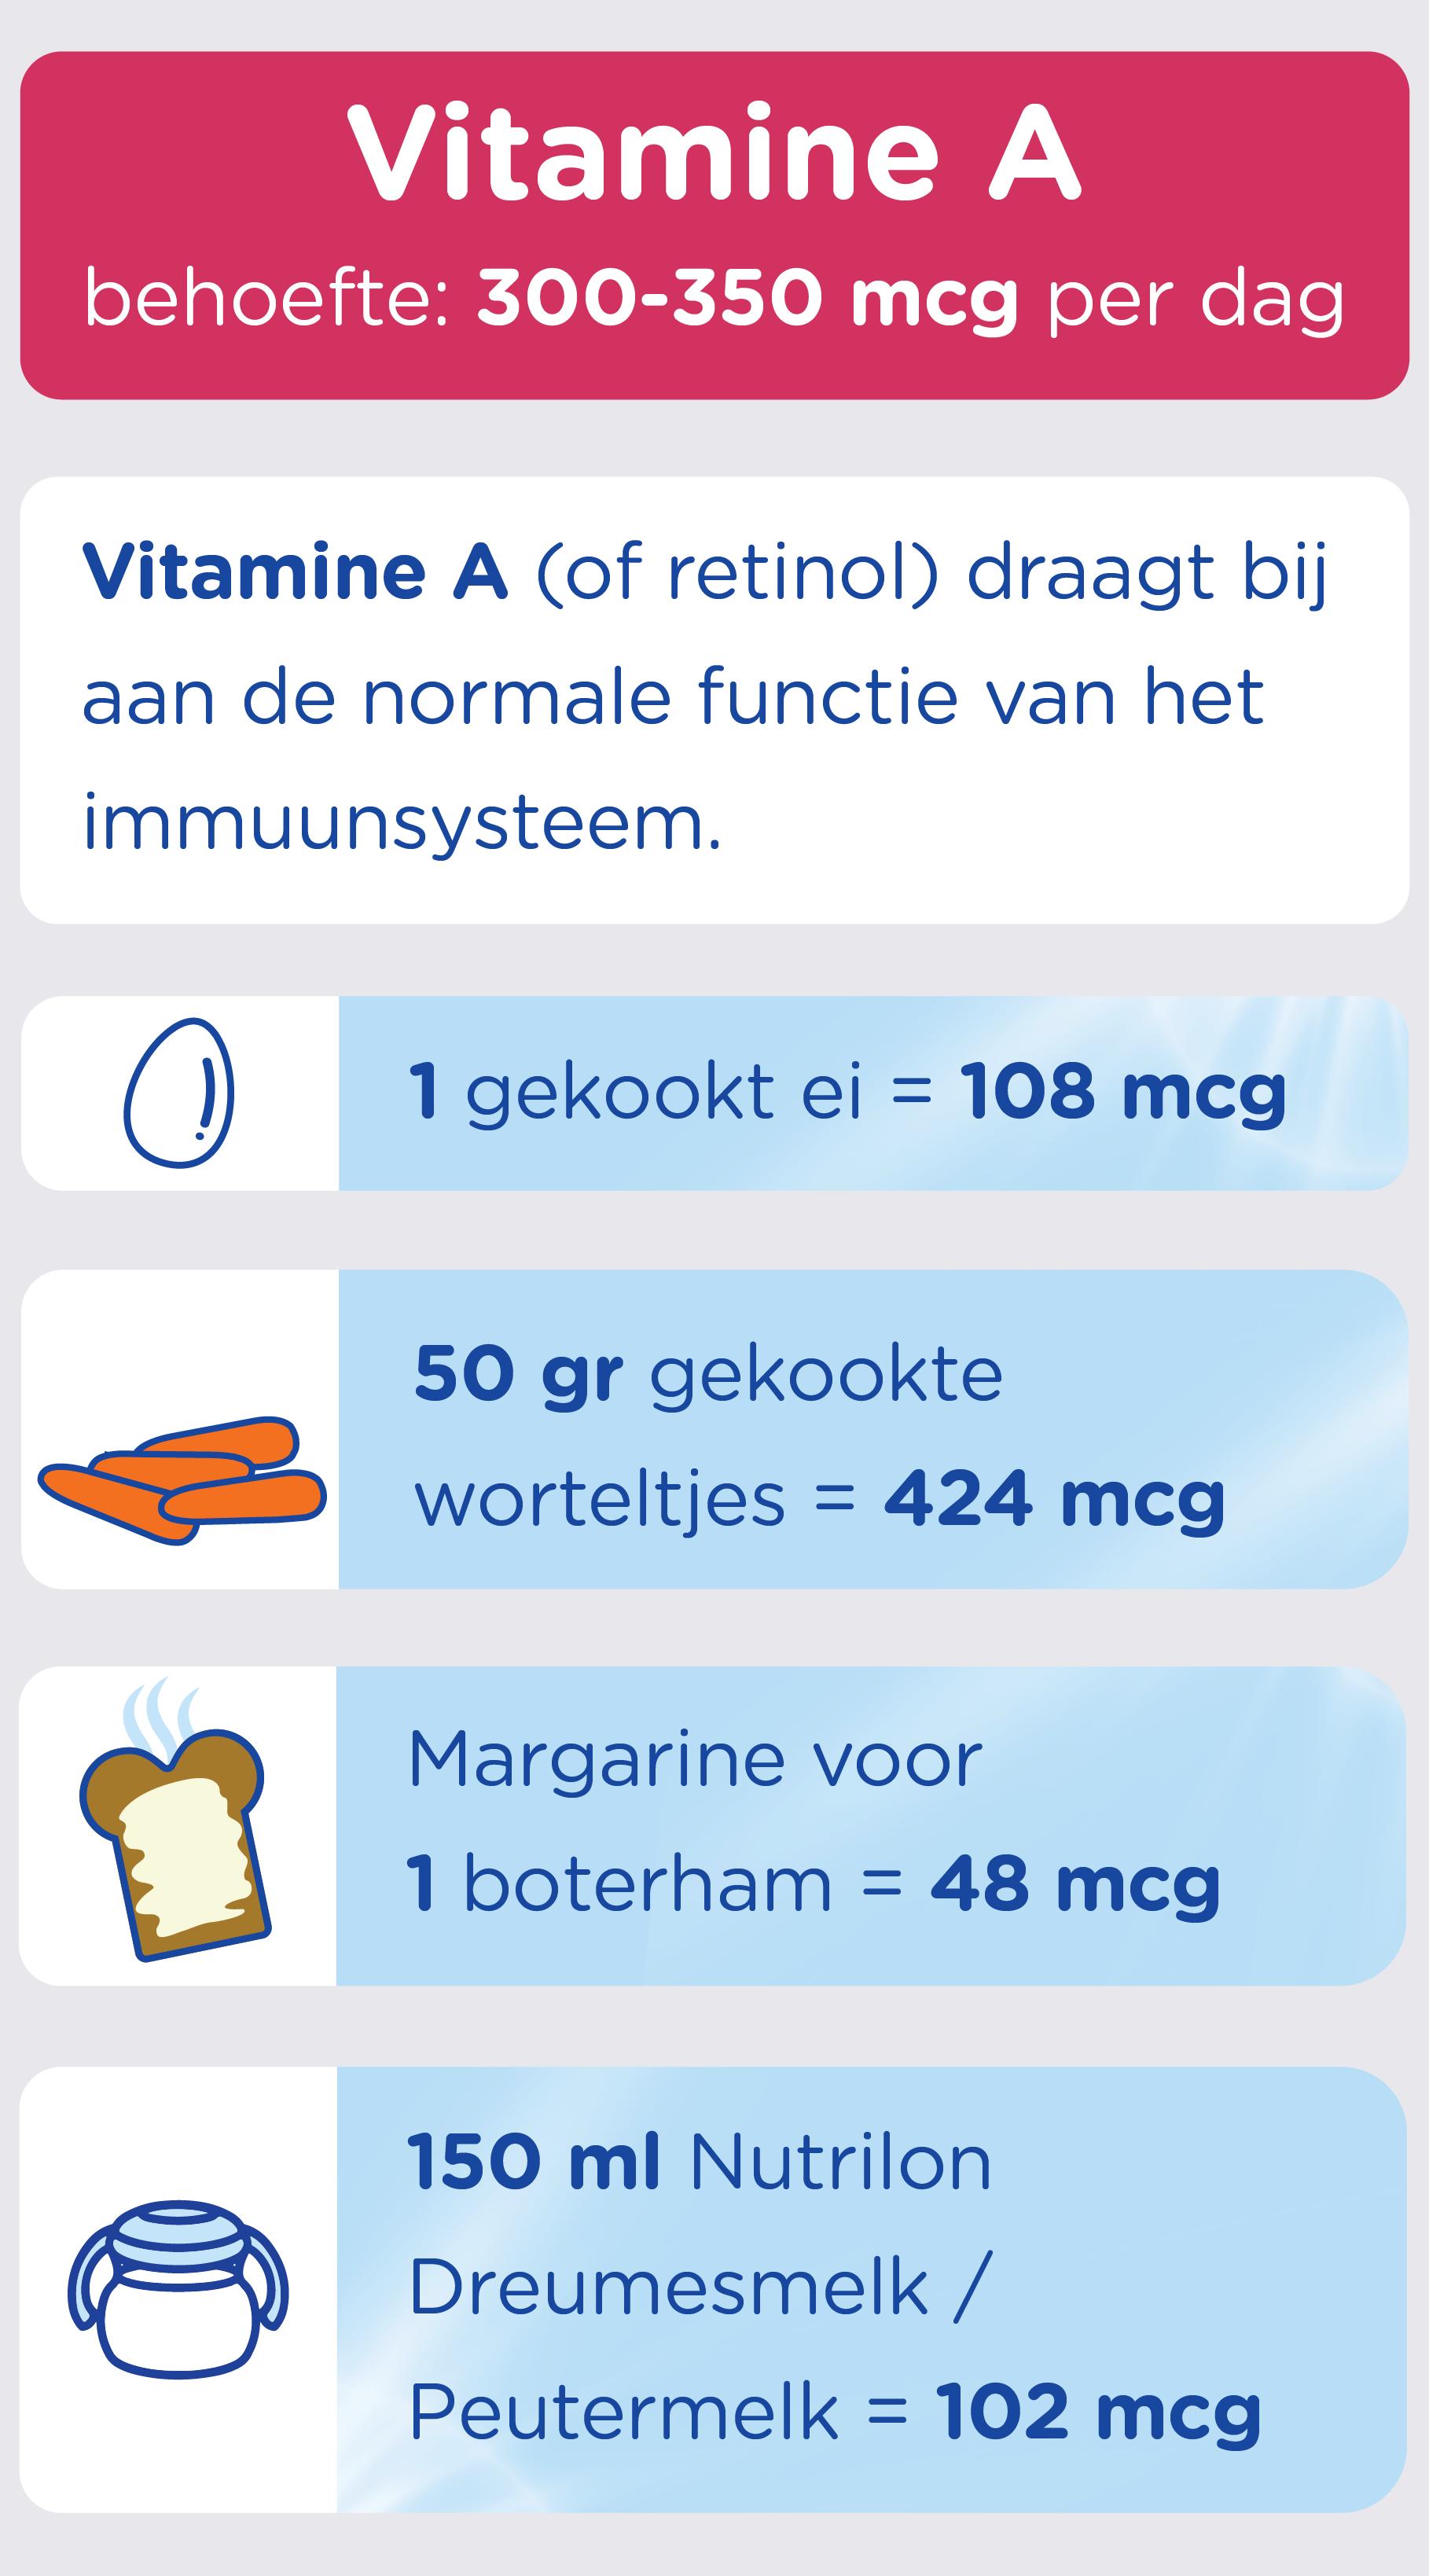 vitamine a behoefte van peuters